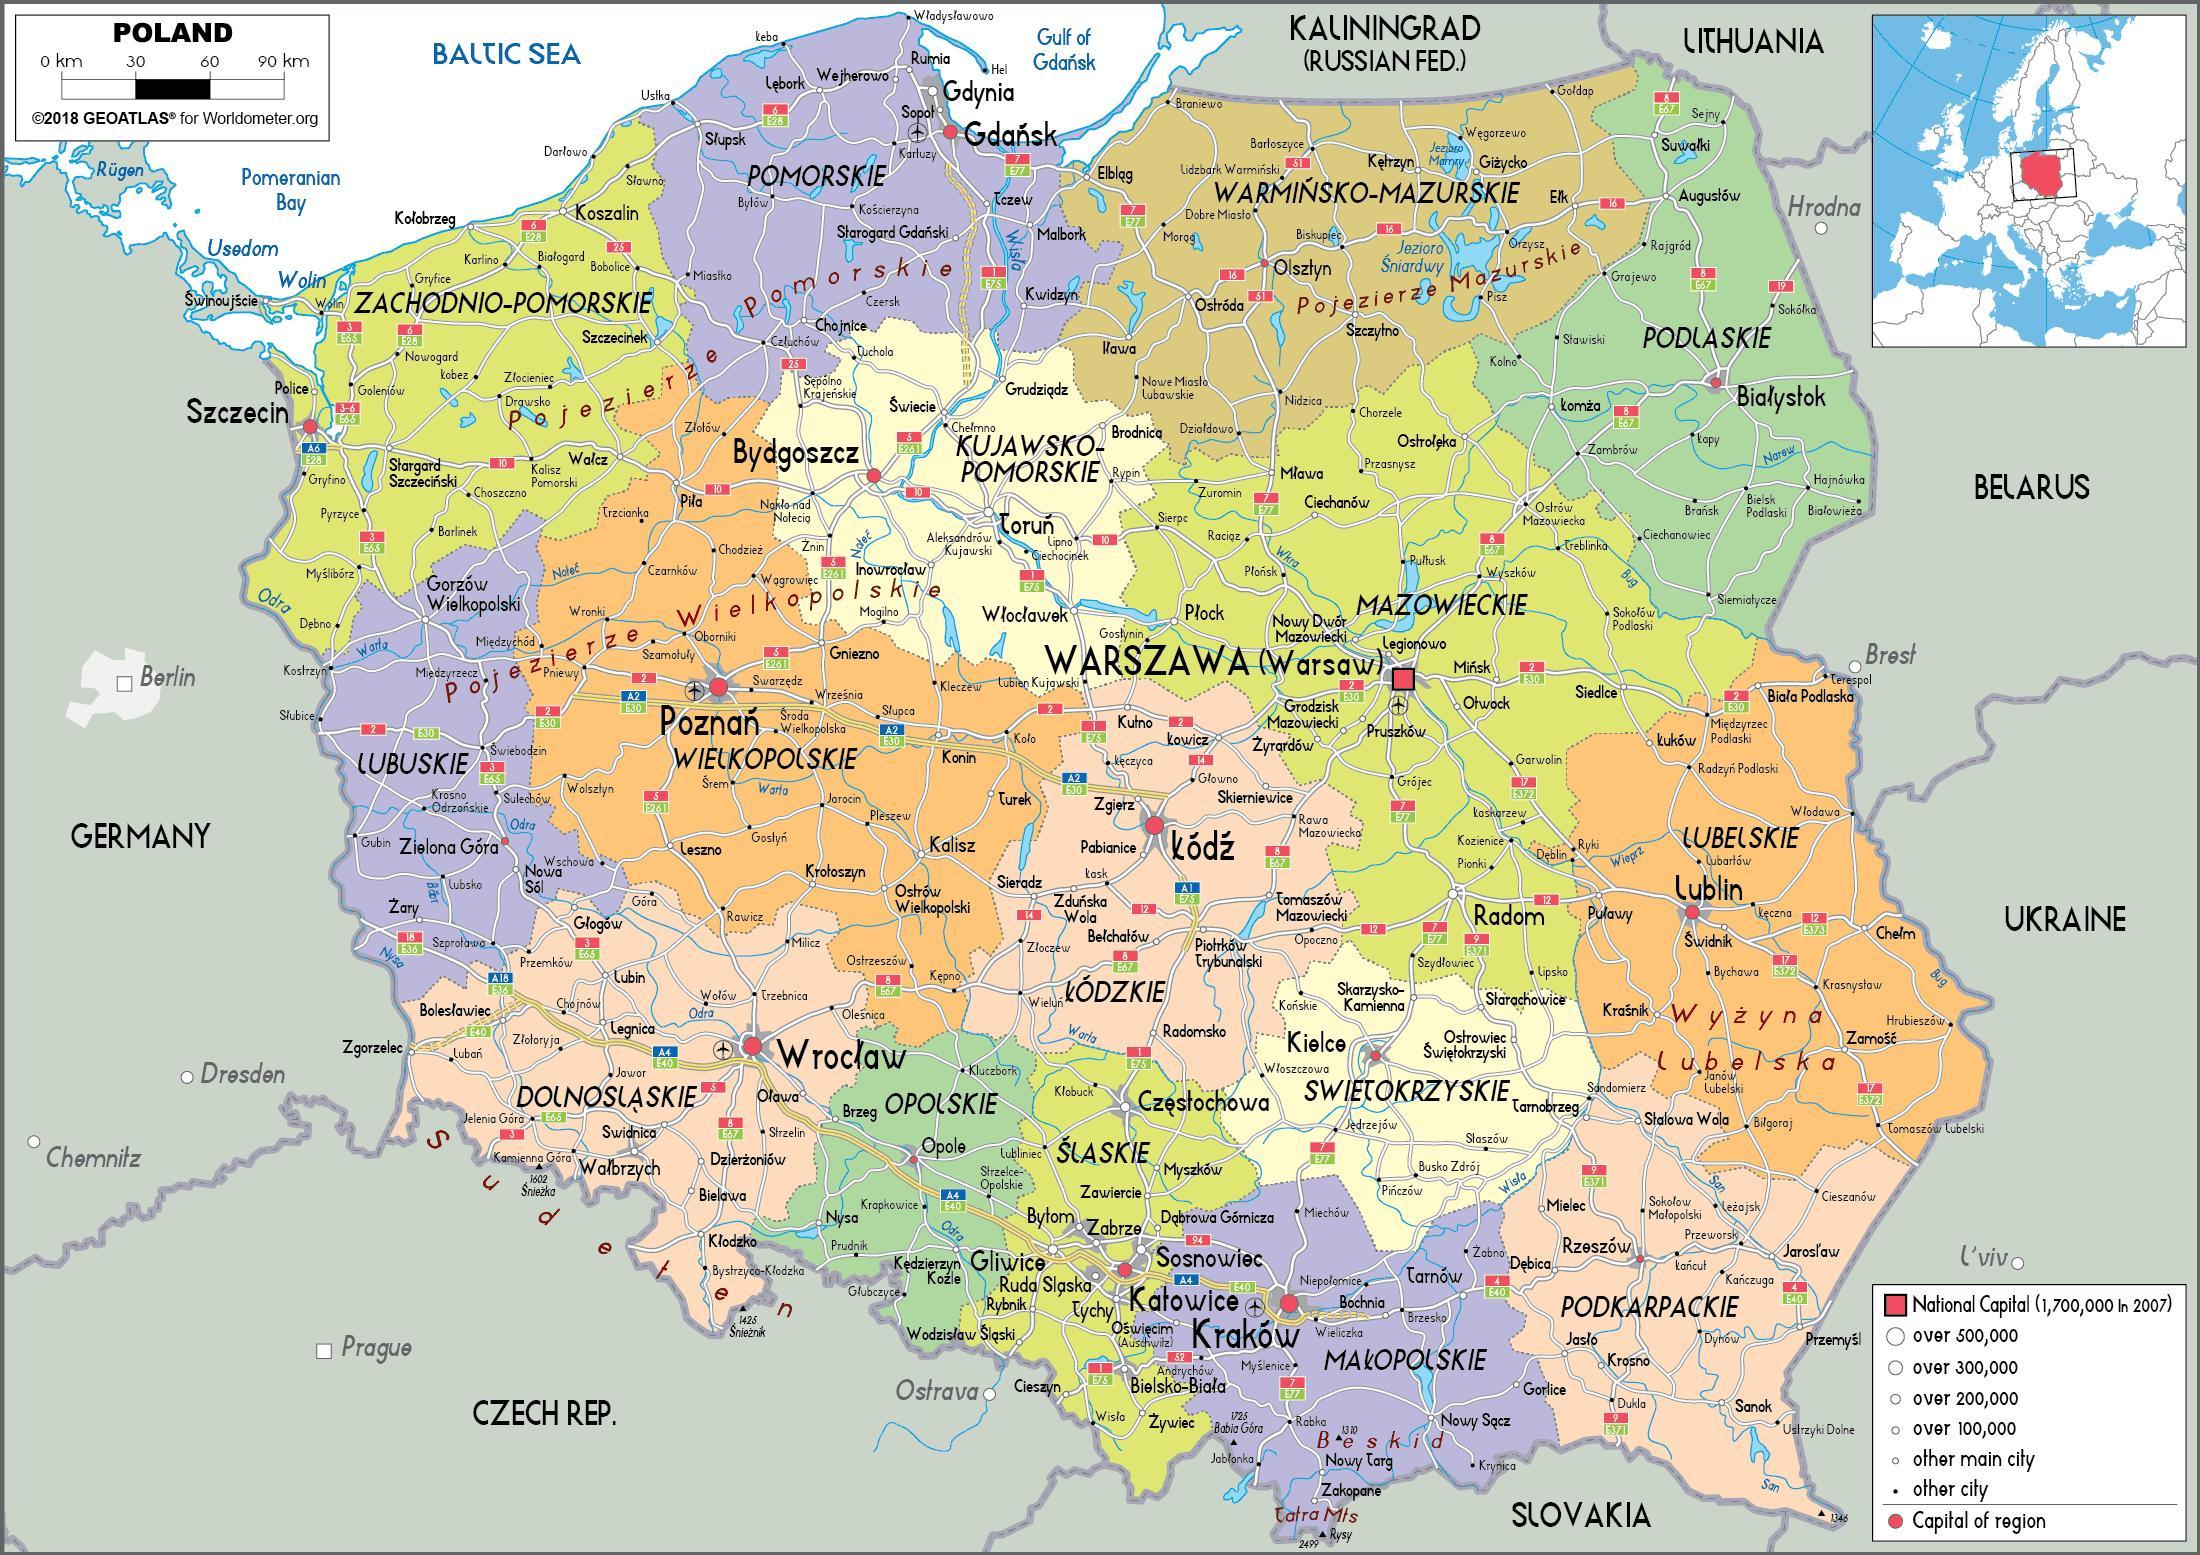 karta europa azerbaijan Karta Poljske i susjednih zemalja   Poljske i susjednih zemalja  karta europa azerbaijan